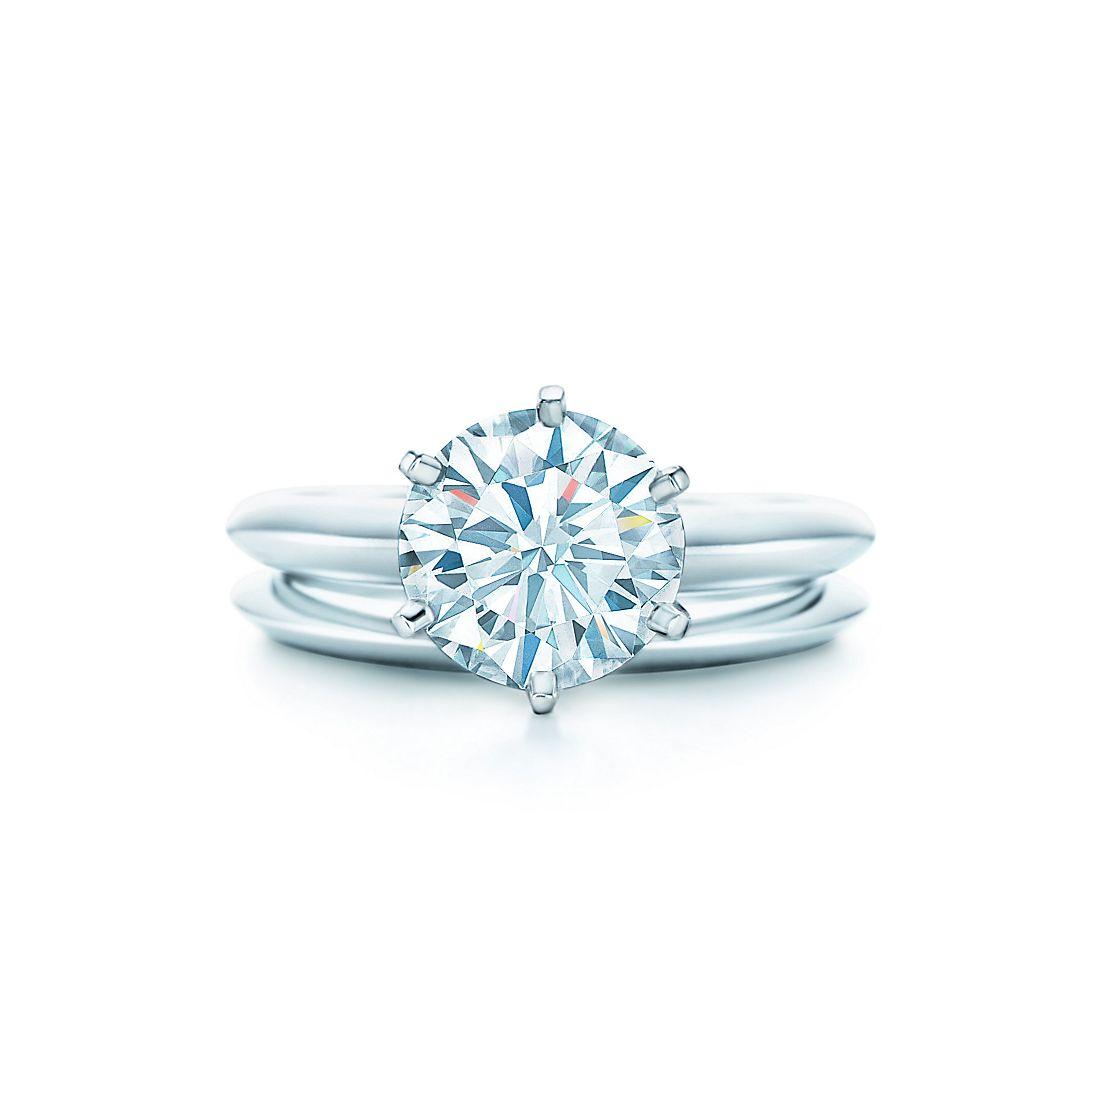 Engagement ring tiffany  The Tiffany® Setting Engagement Rings | Tiffany & Co.